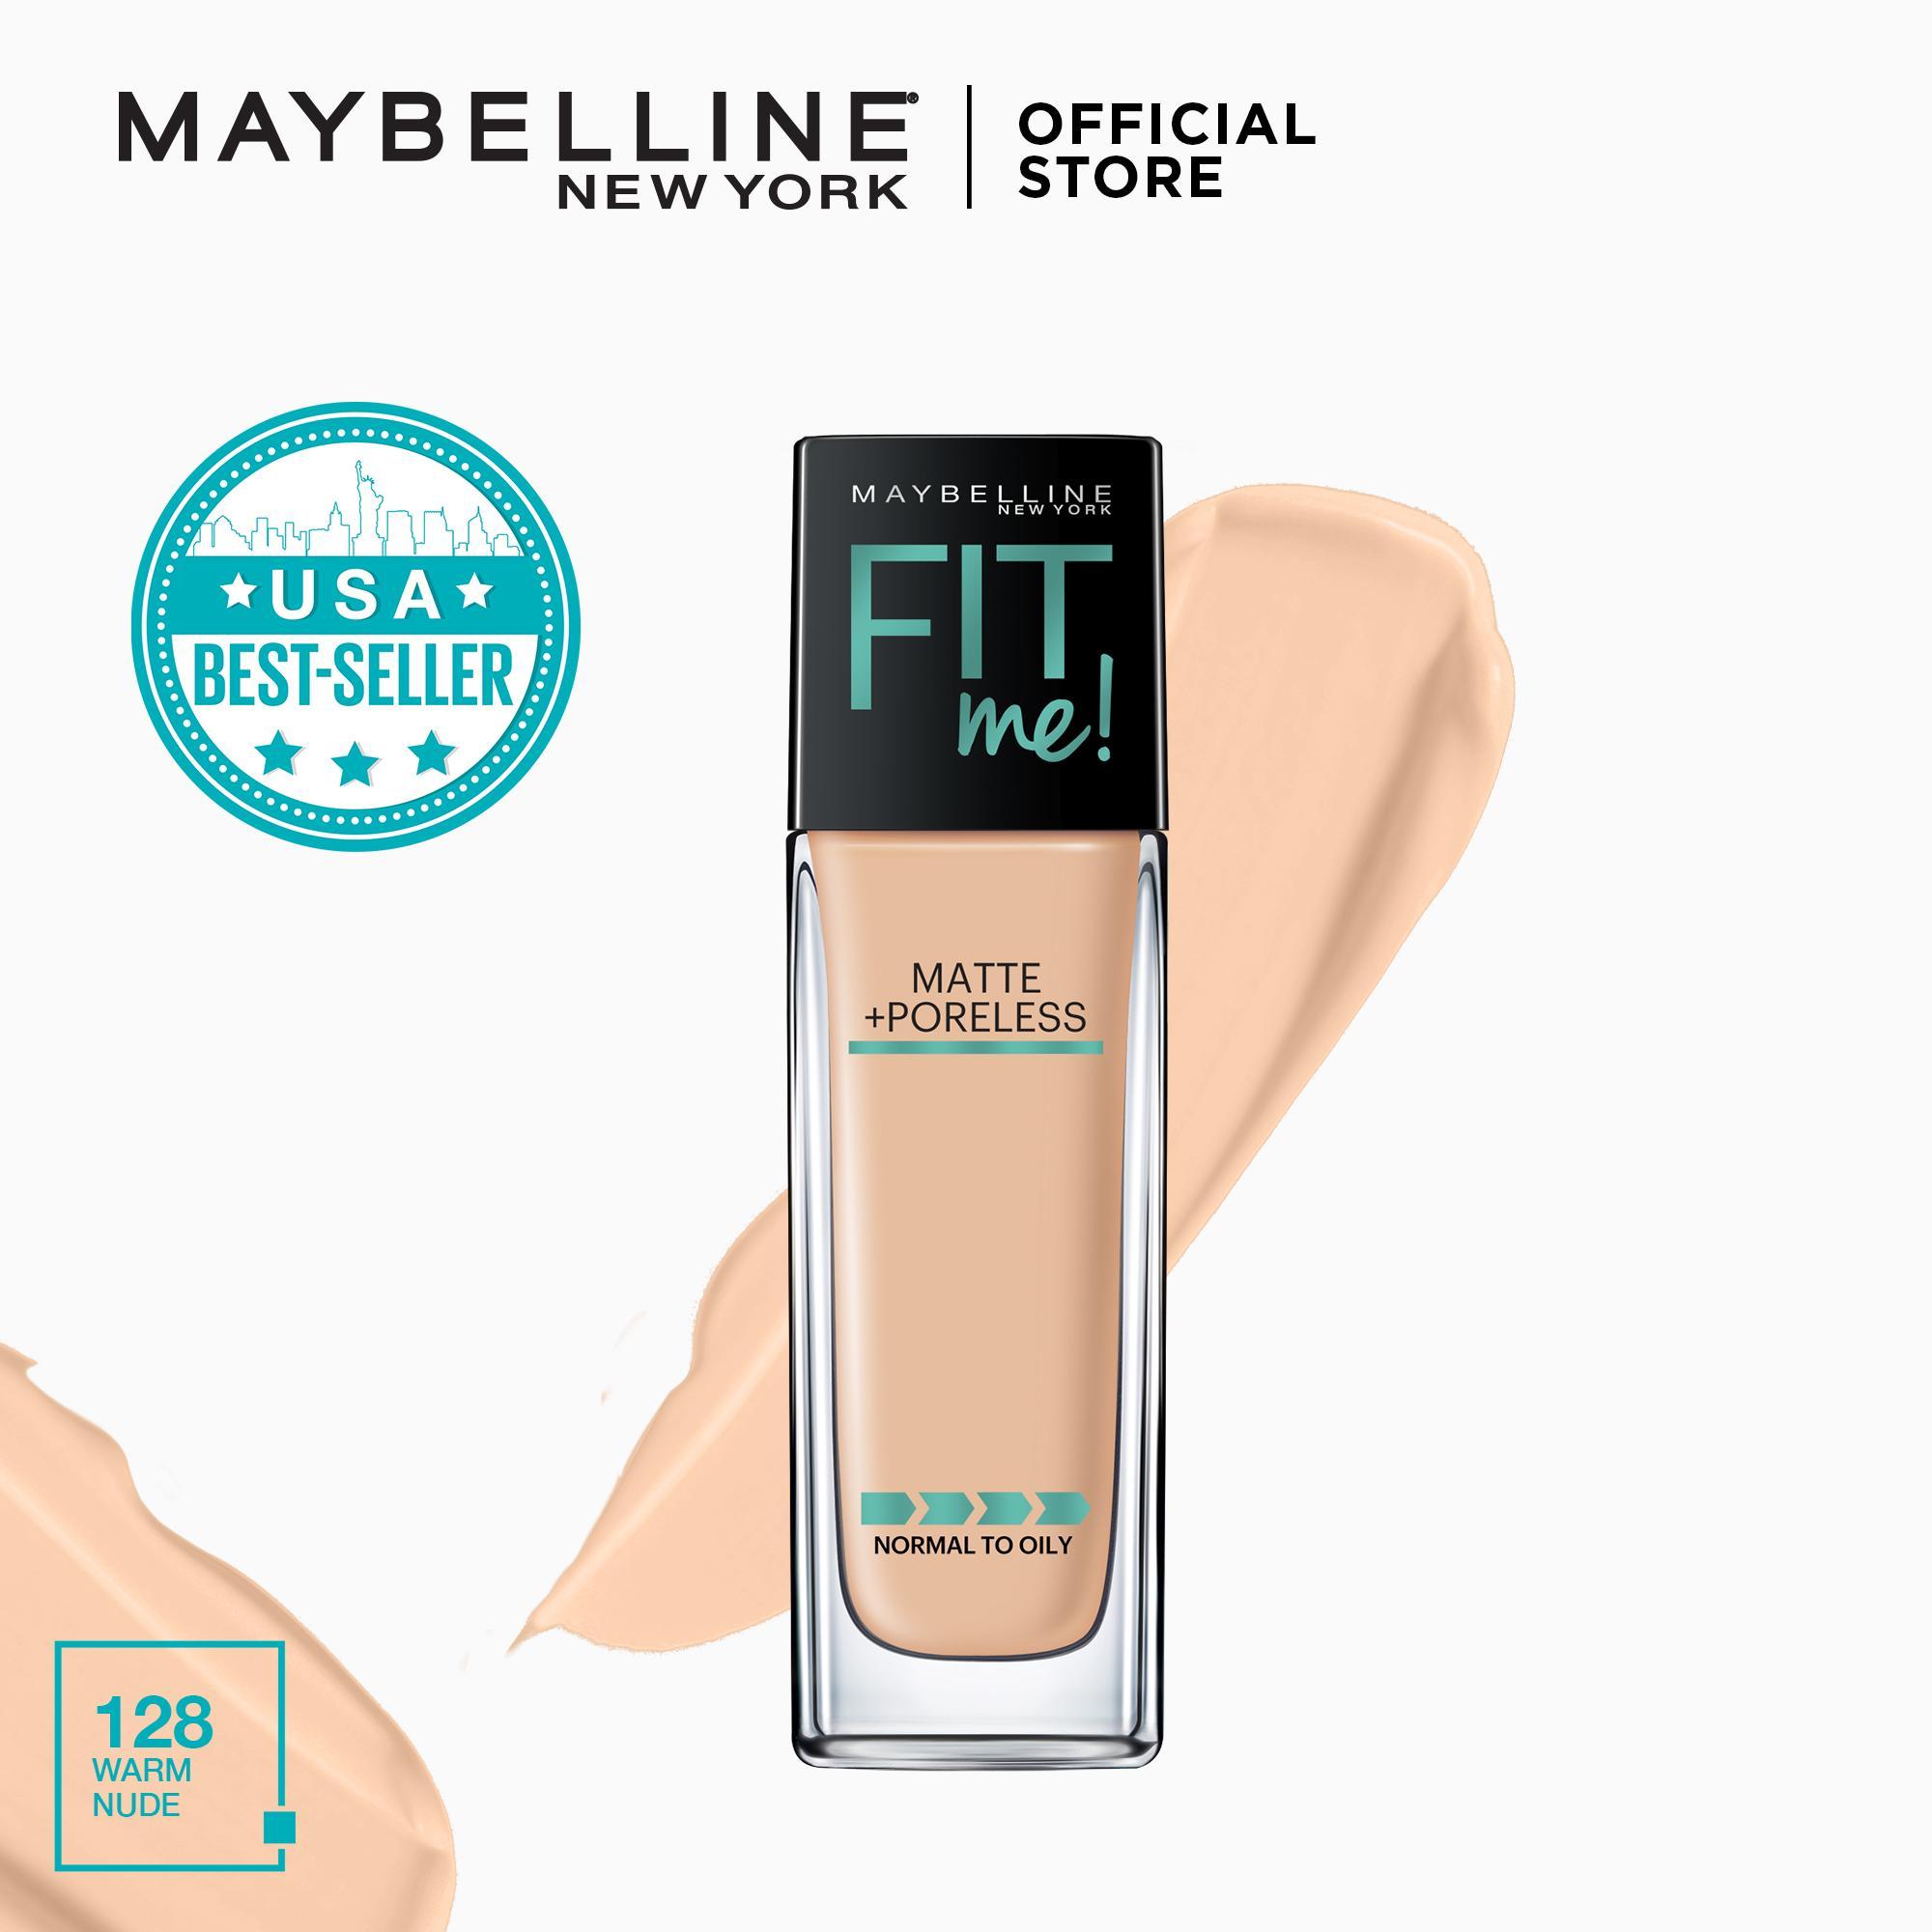 Maybelline Dream Satin Two Way Cake 02 Nude Beige Daftar Harga 01 Light Fit Me Matte Poreless Liquid Foundation 30 Ml 128 Warm